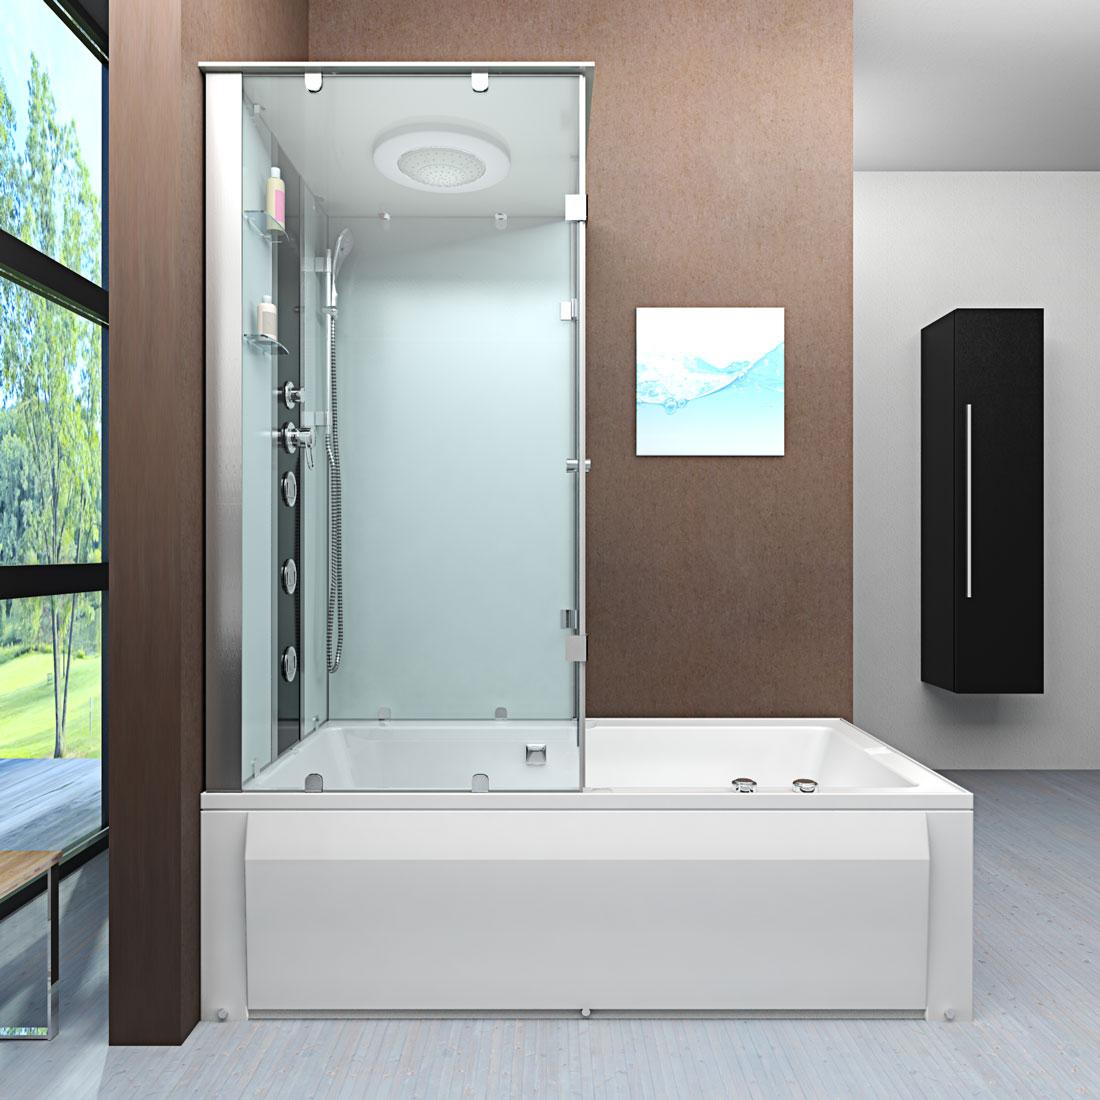 acquavapore dtp50 a002r dusch wannen kombi in 90x180cm trendbad24. Black Bedroom Furniture Sets. Home Design Ideas